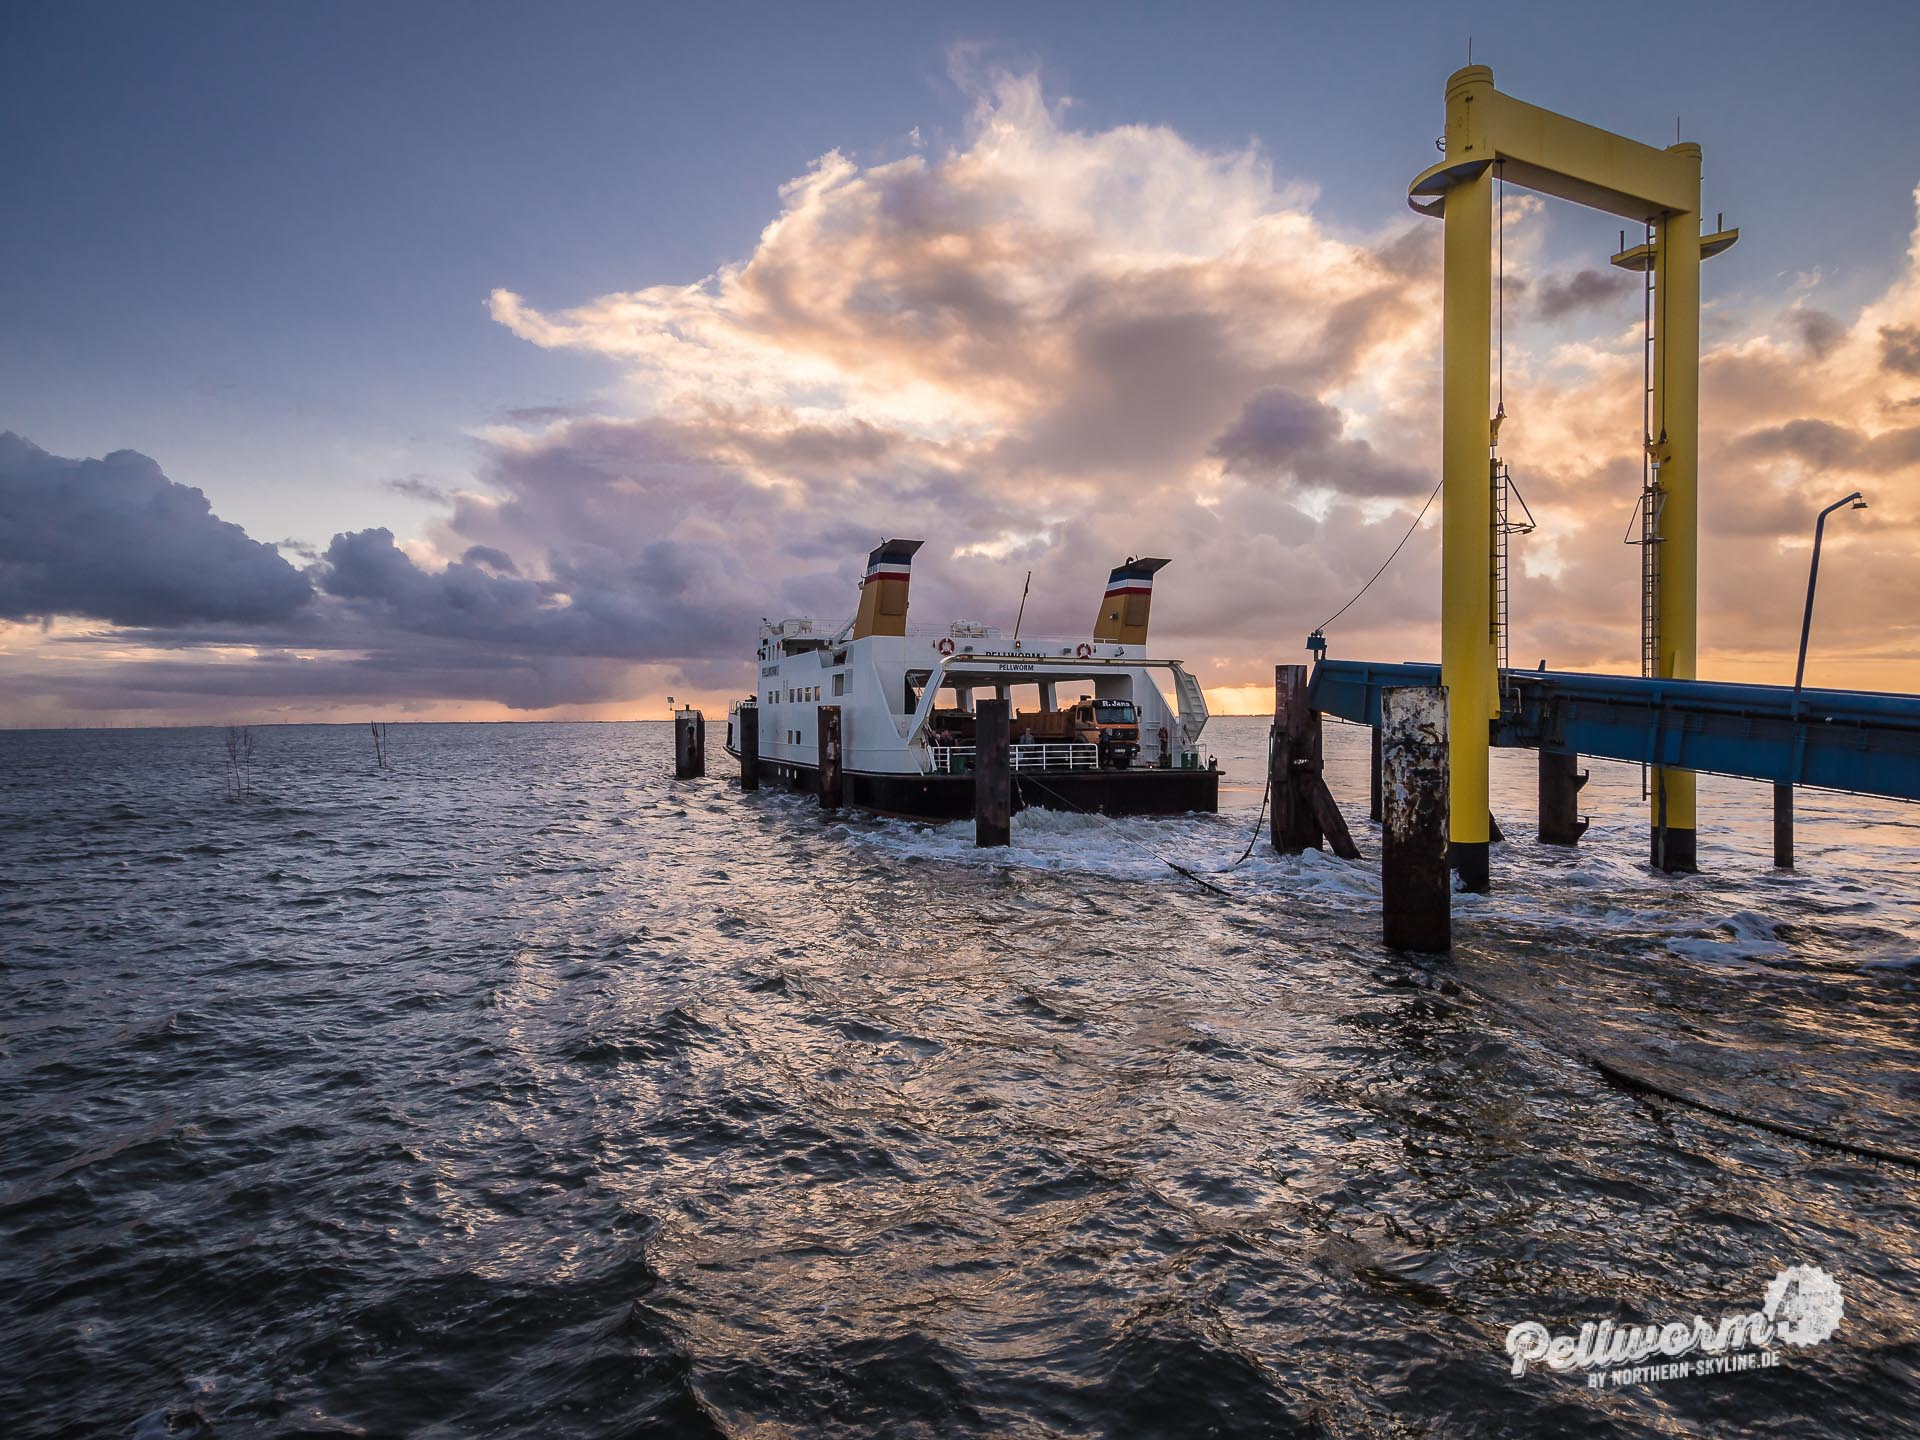 Der Pellwormer Tiefwasseranleger bei Sonnenaufgang